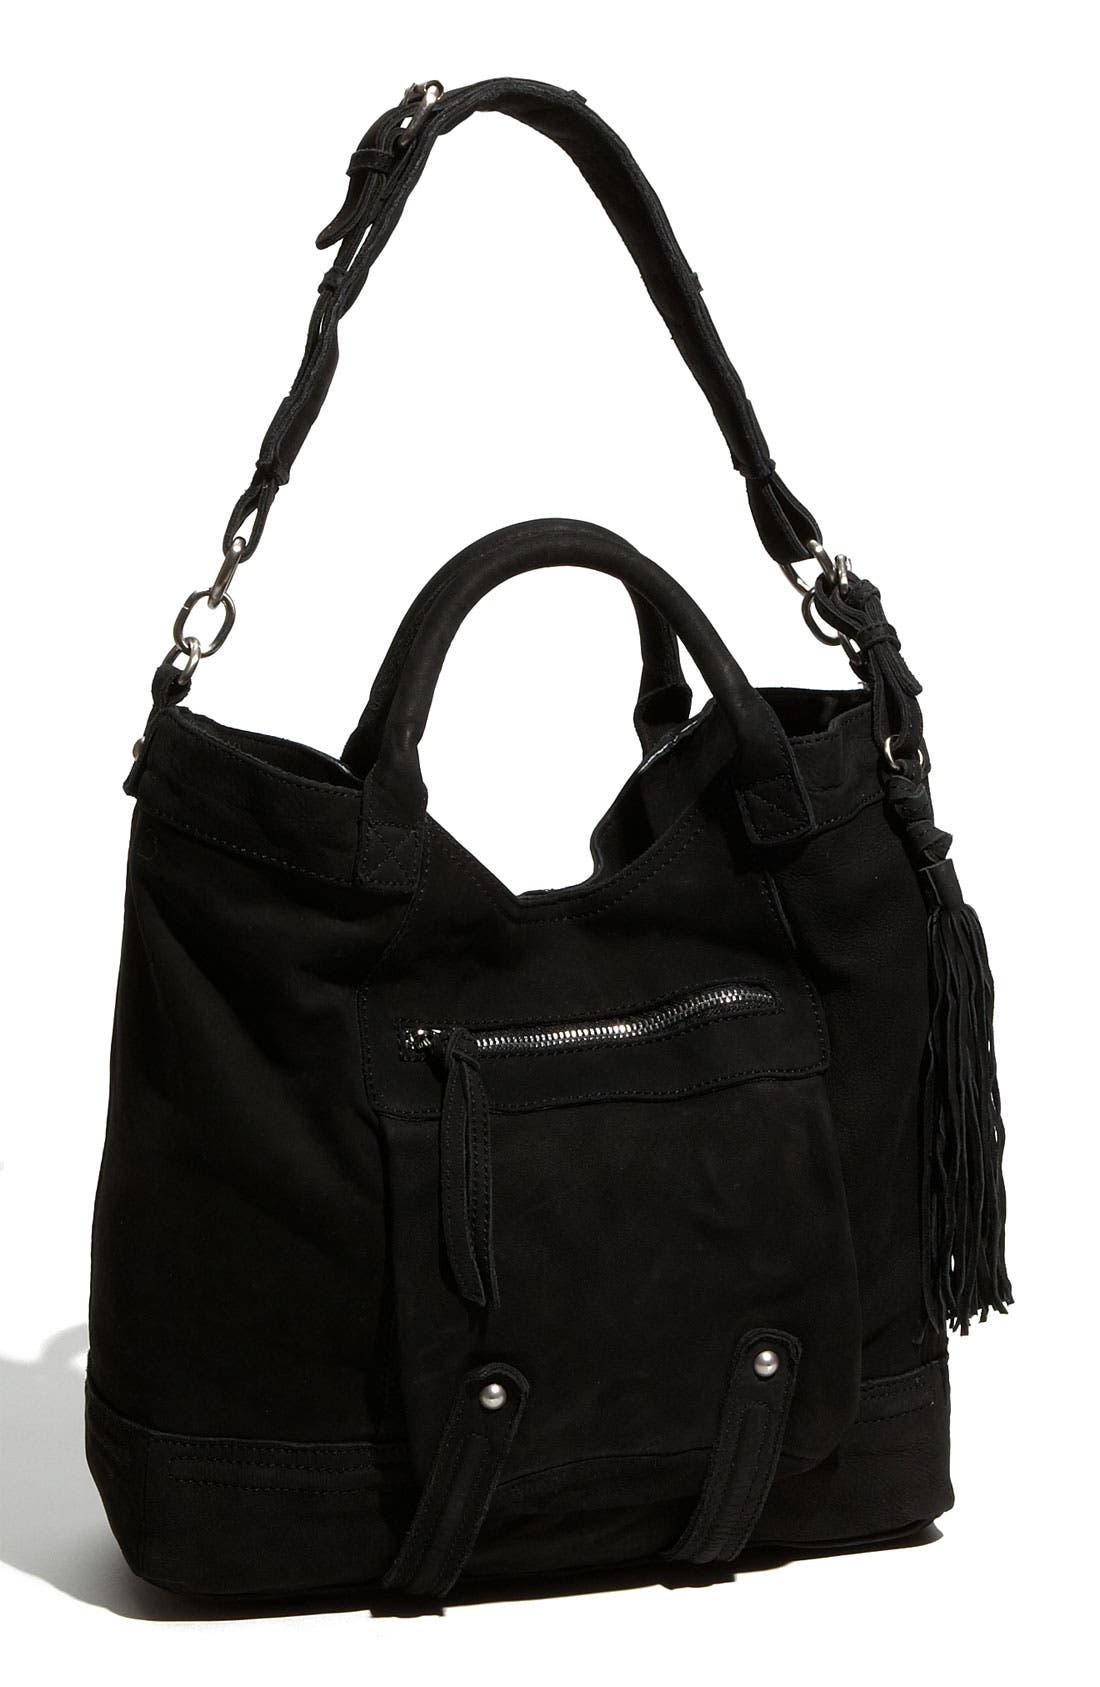 Main Image - Revel NY 'Chelsea' Leather Tote